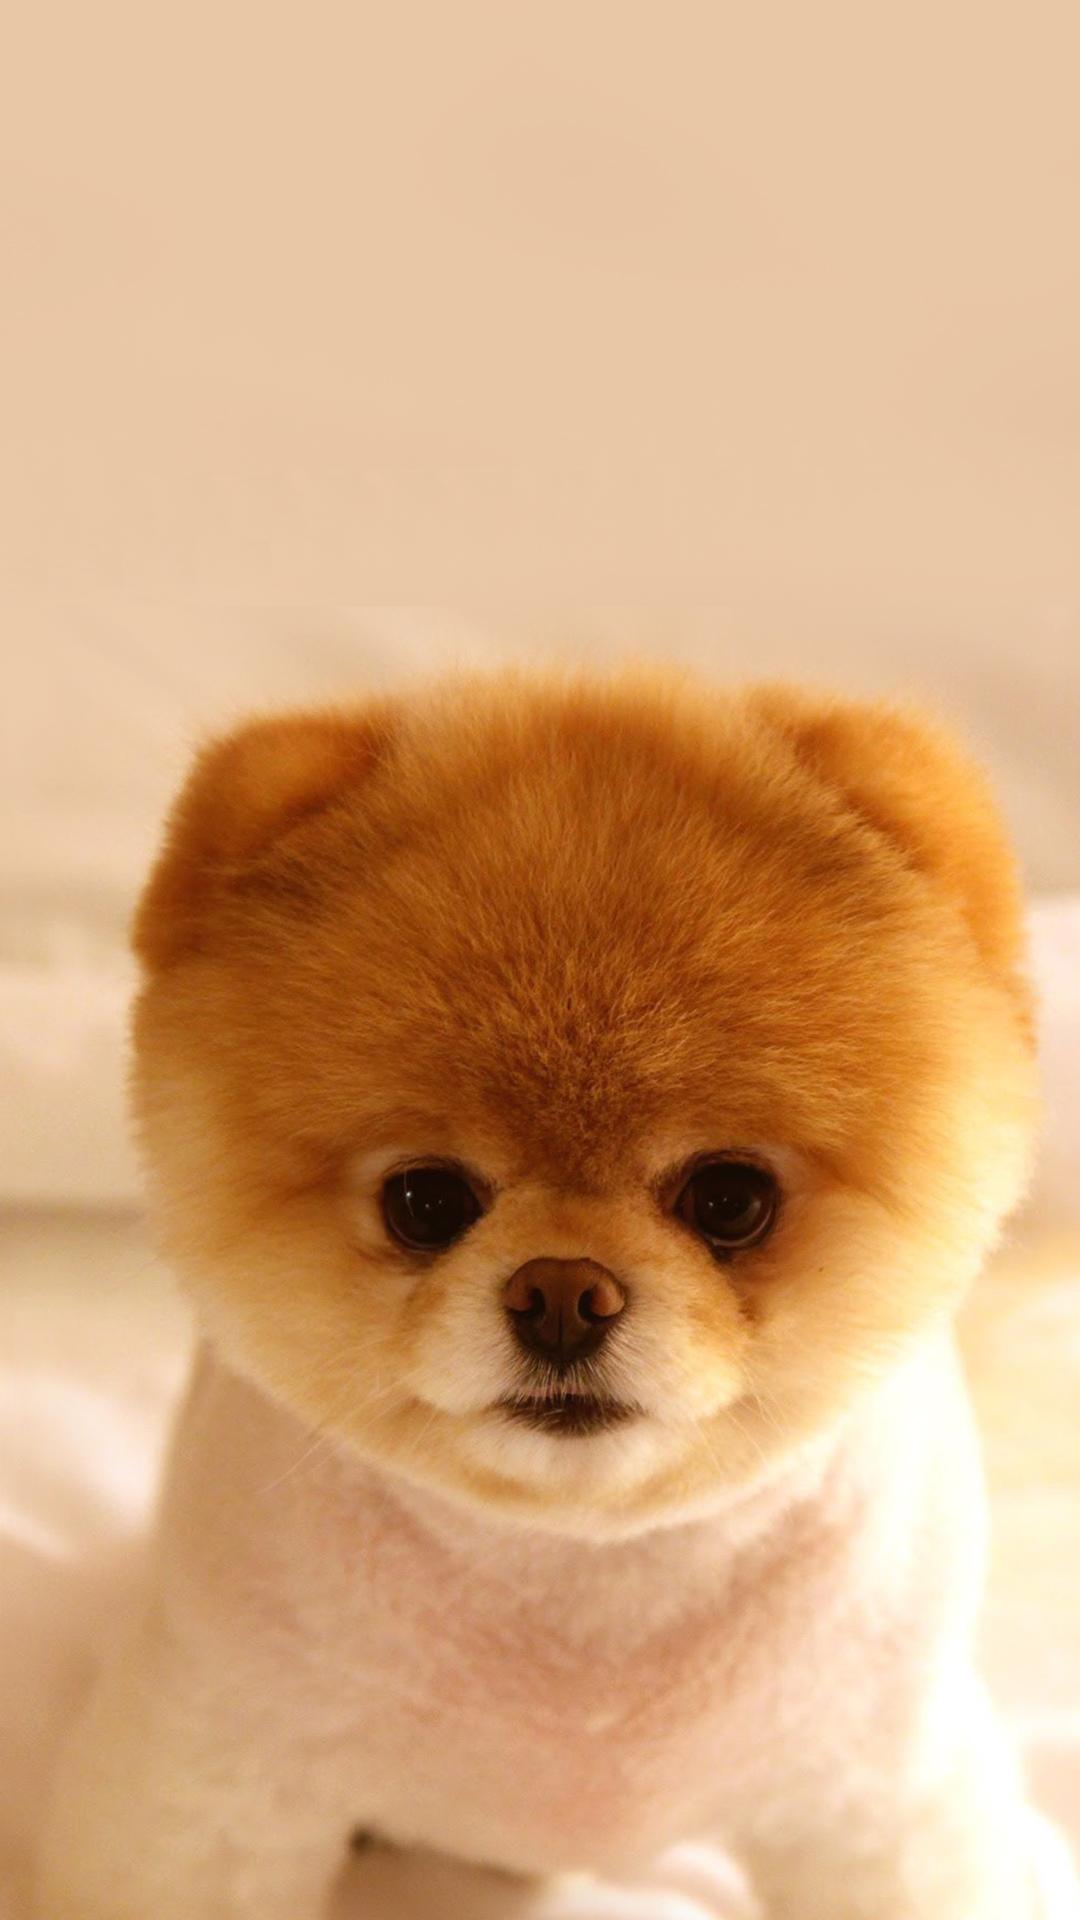 Free HD Cutest Puppy Dog Phone Wallpaper...4982